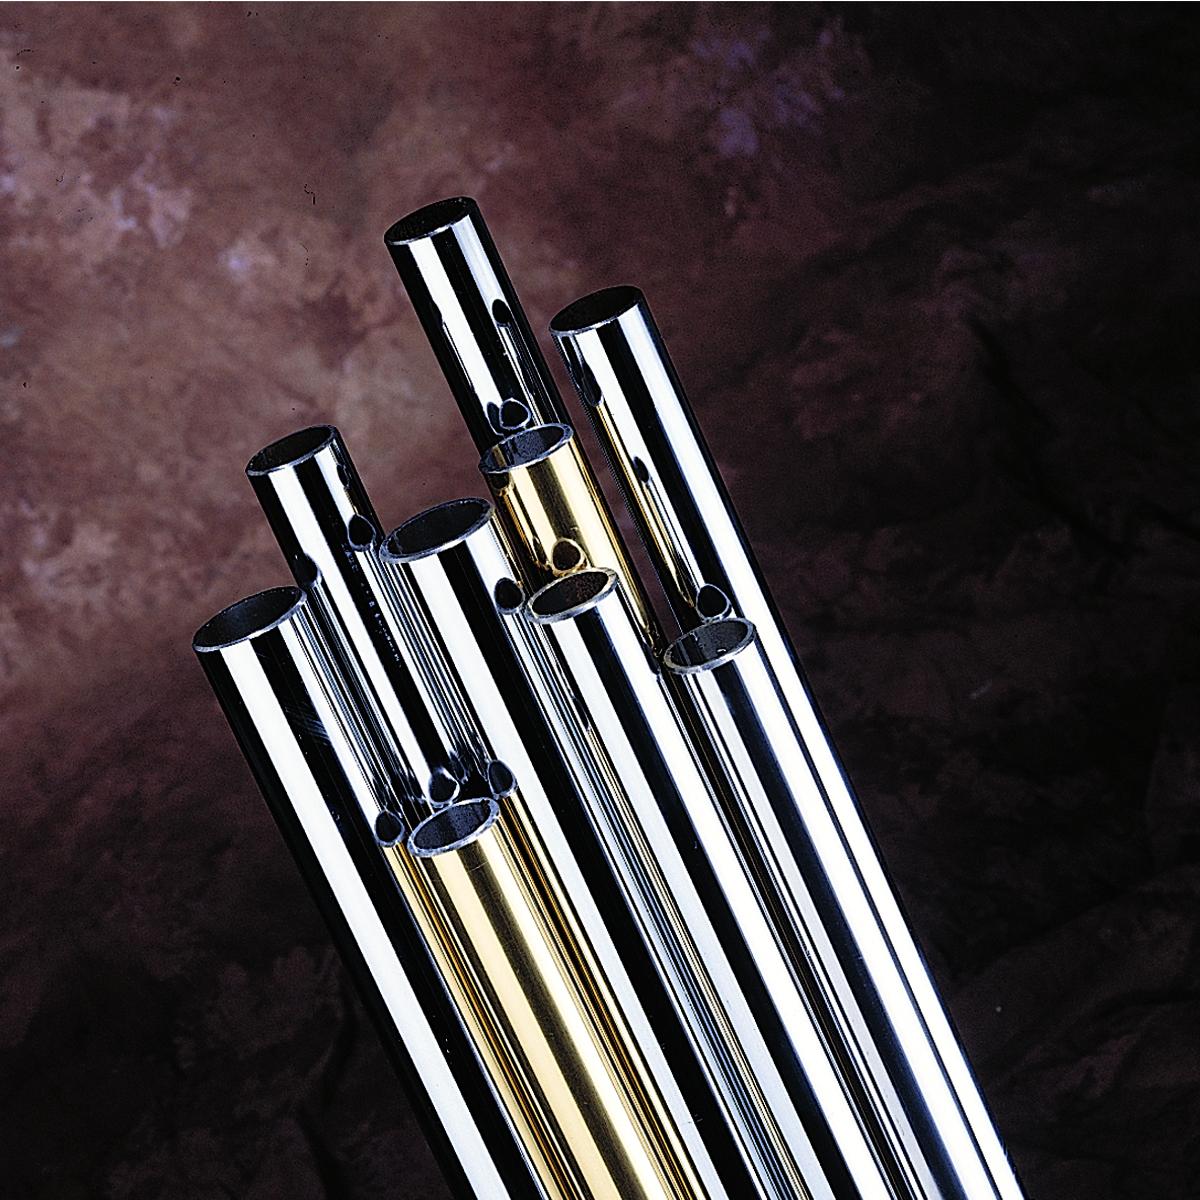 Shelving Hardware Closet Rods 1 1 16 Diameter 8